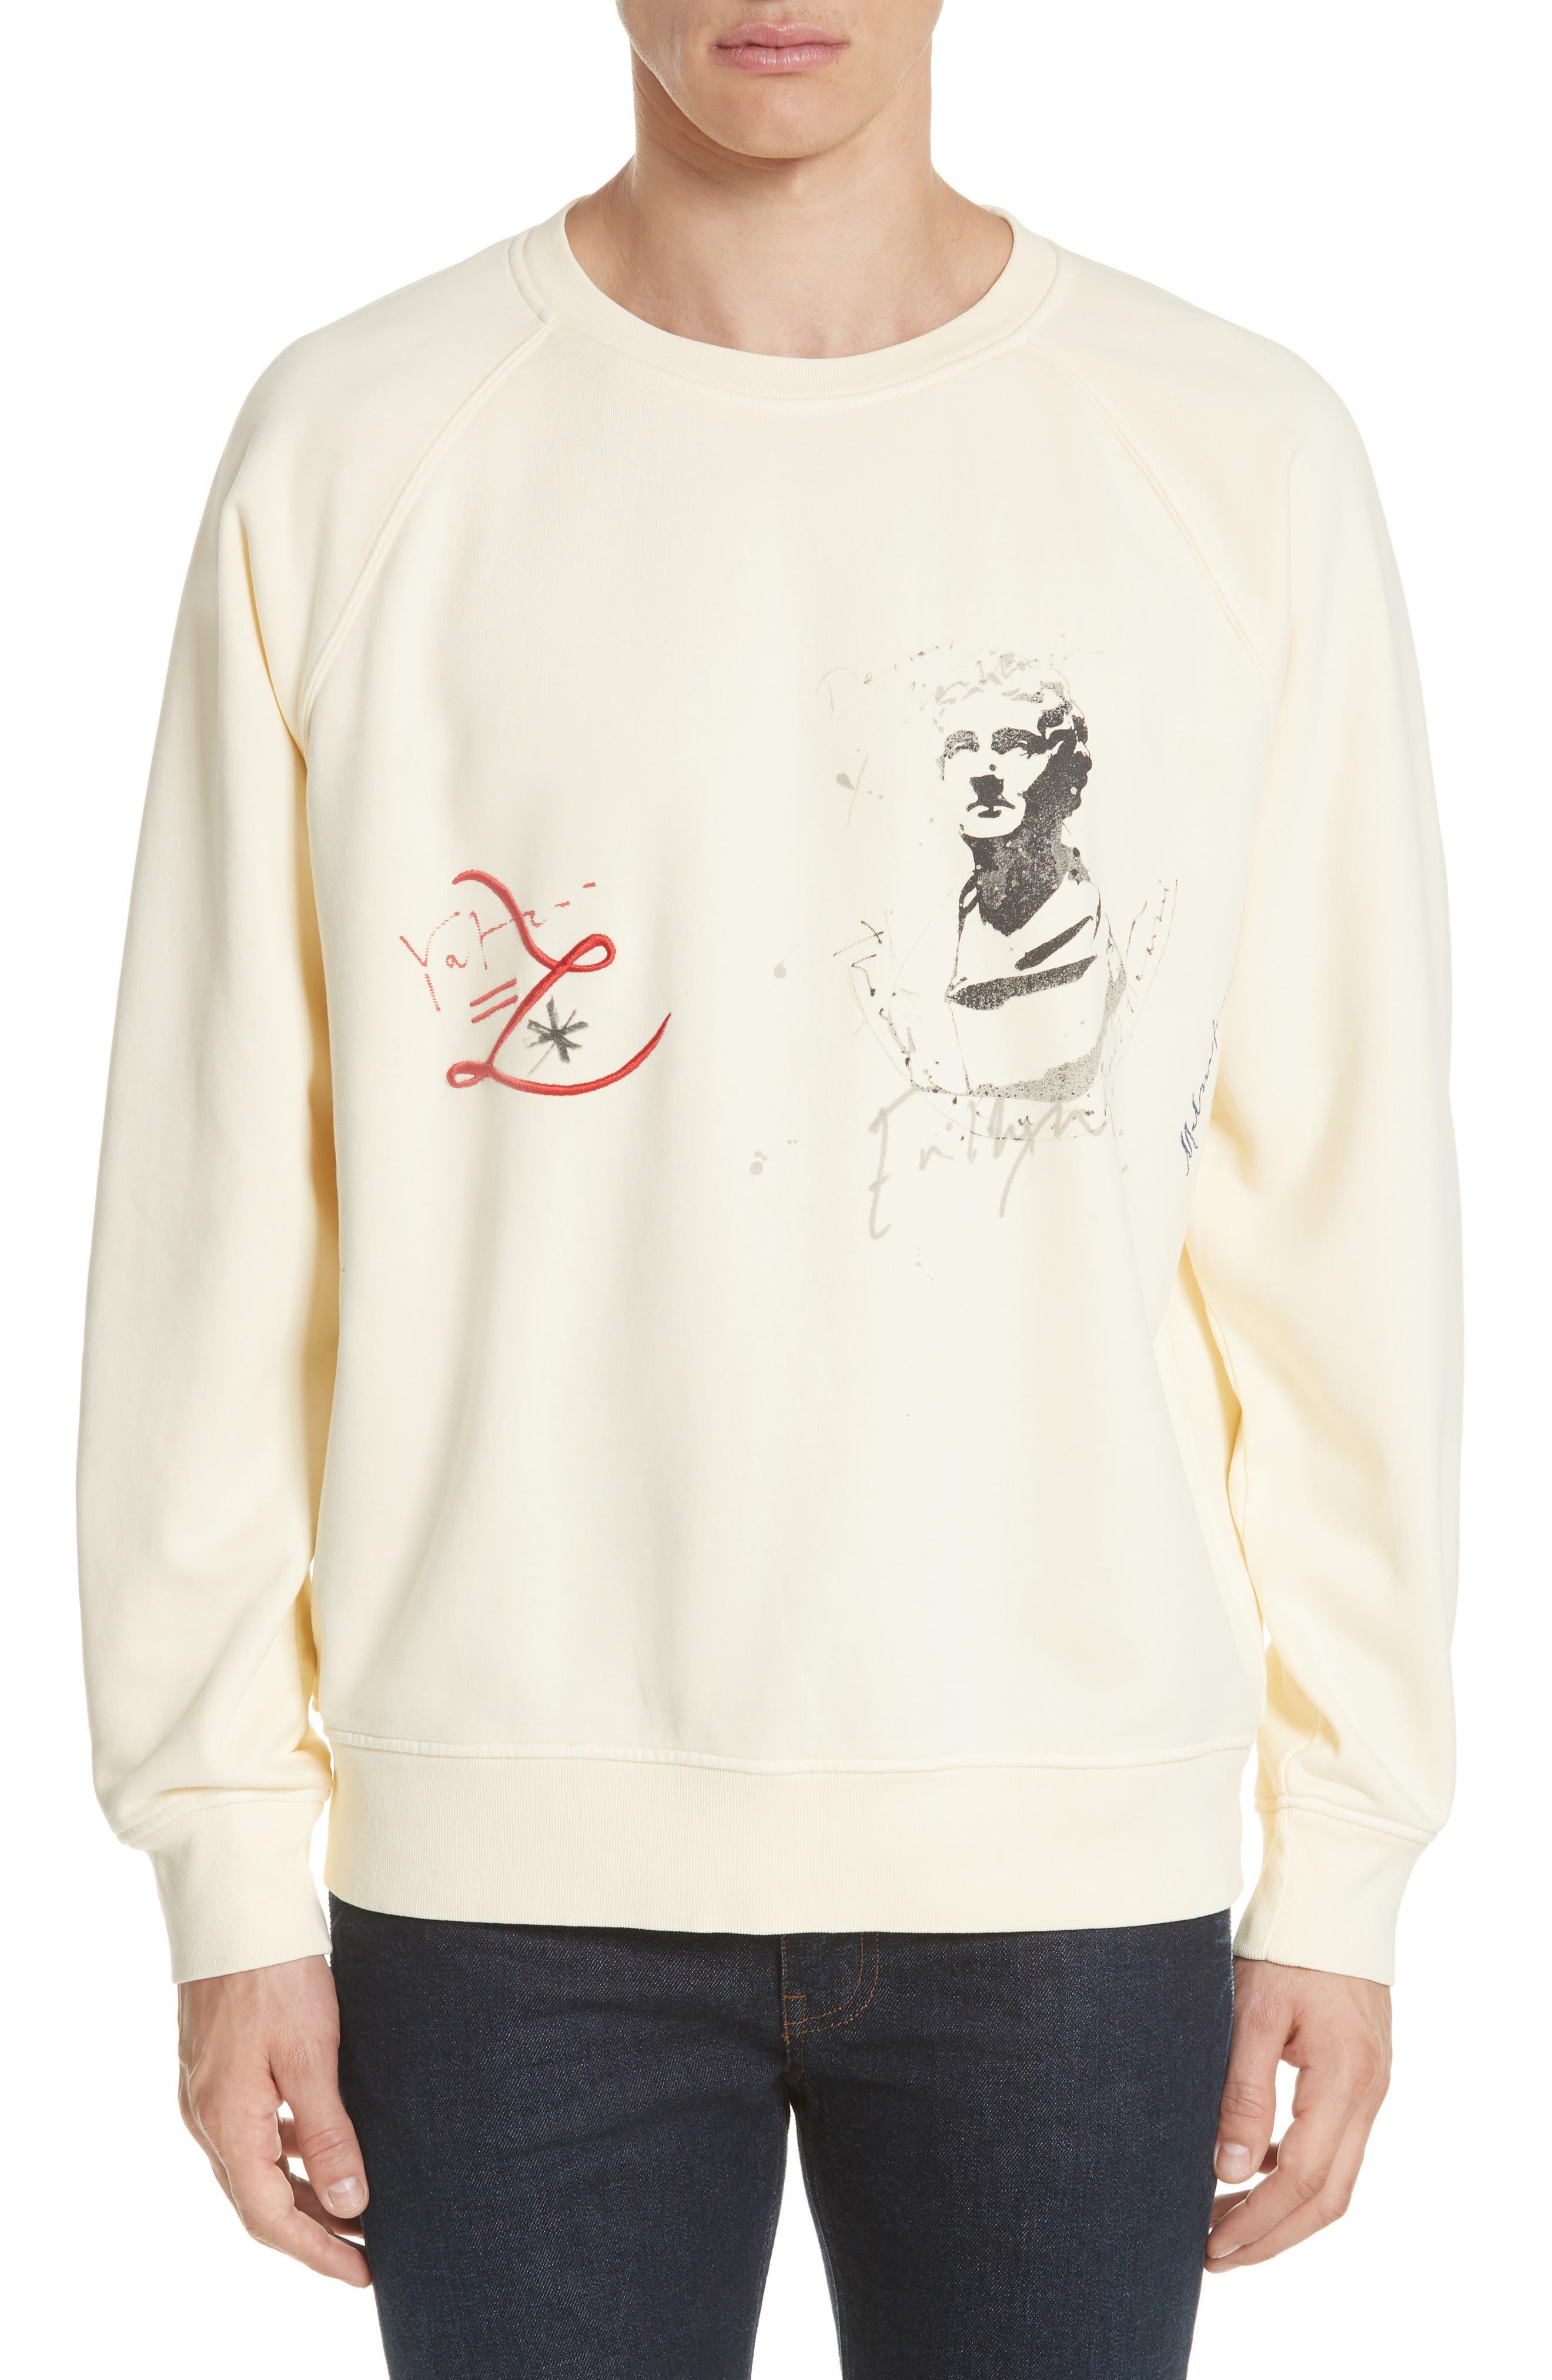 Earlford Graphic Sweatshirt,                             Main thumbnail 1, color,                             740